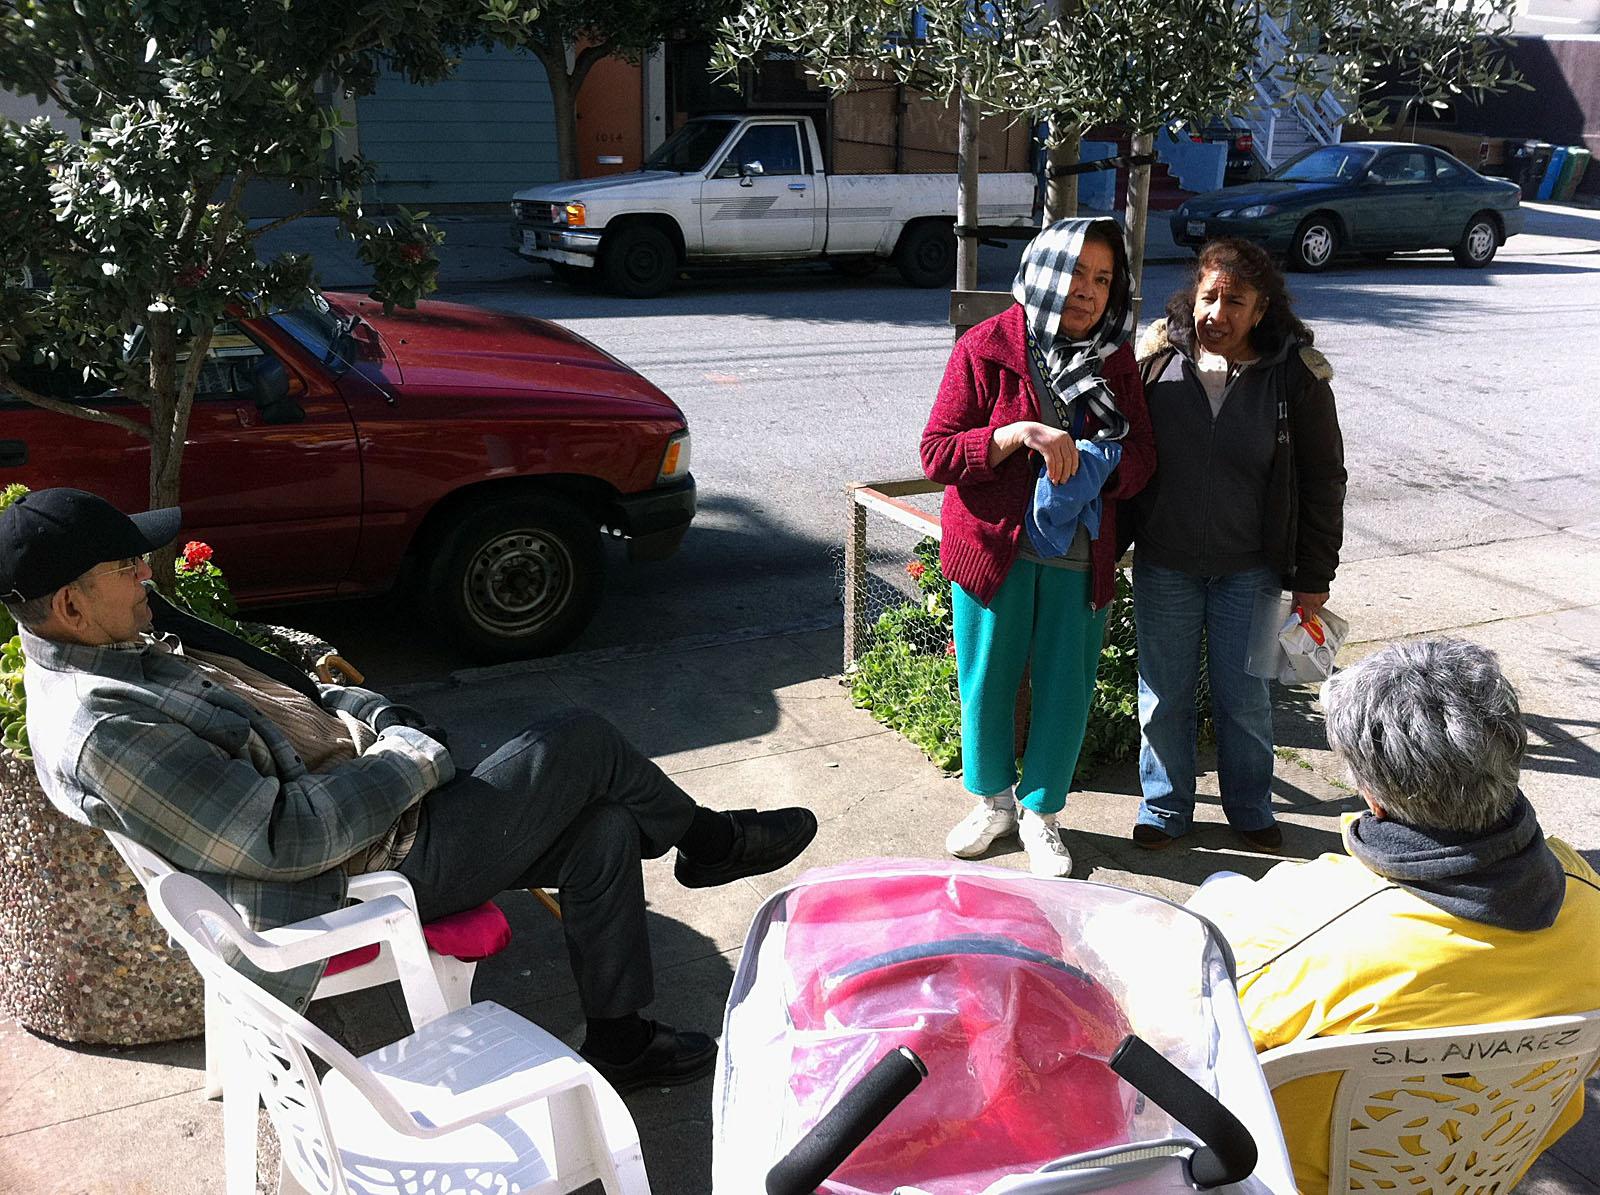 Visiting on Alabama Street